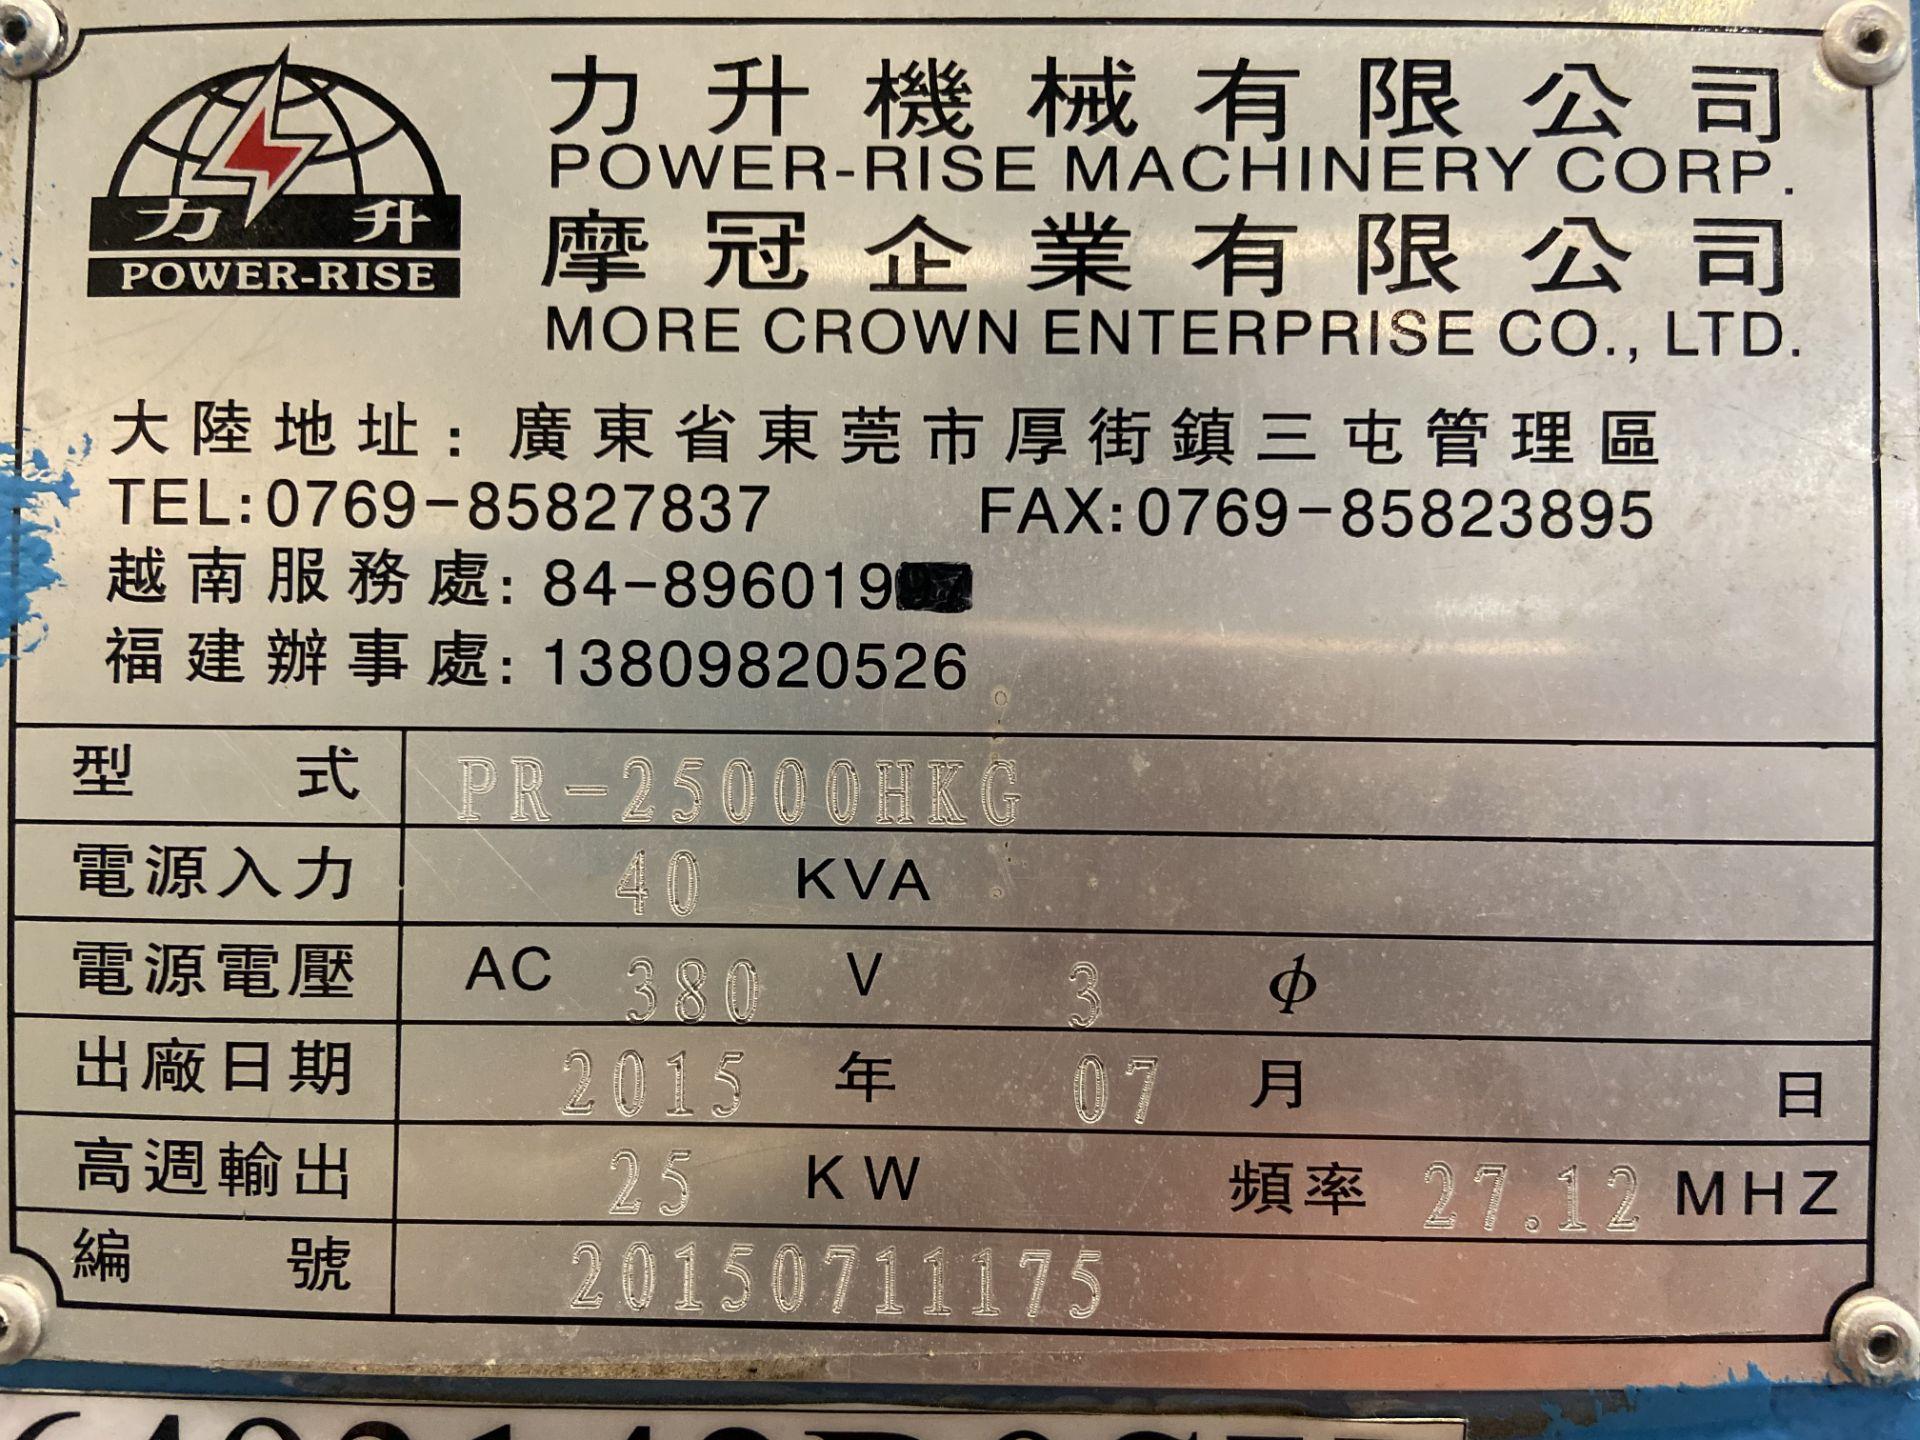 Lot 41 - Máquina de soldadura de alta frecuencia marca Power-Rise, Modelo: PR-25000HKG